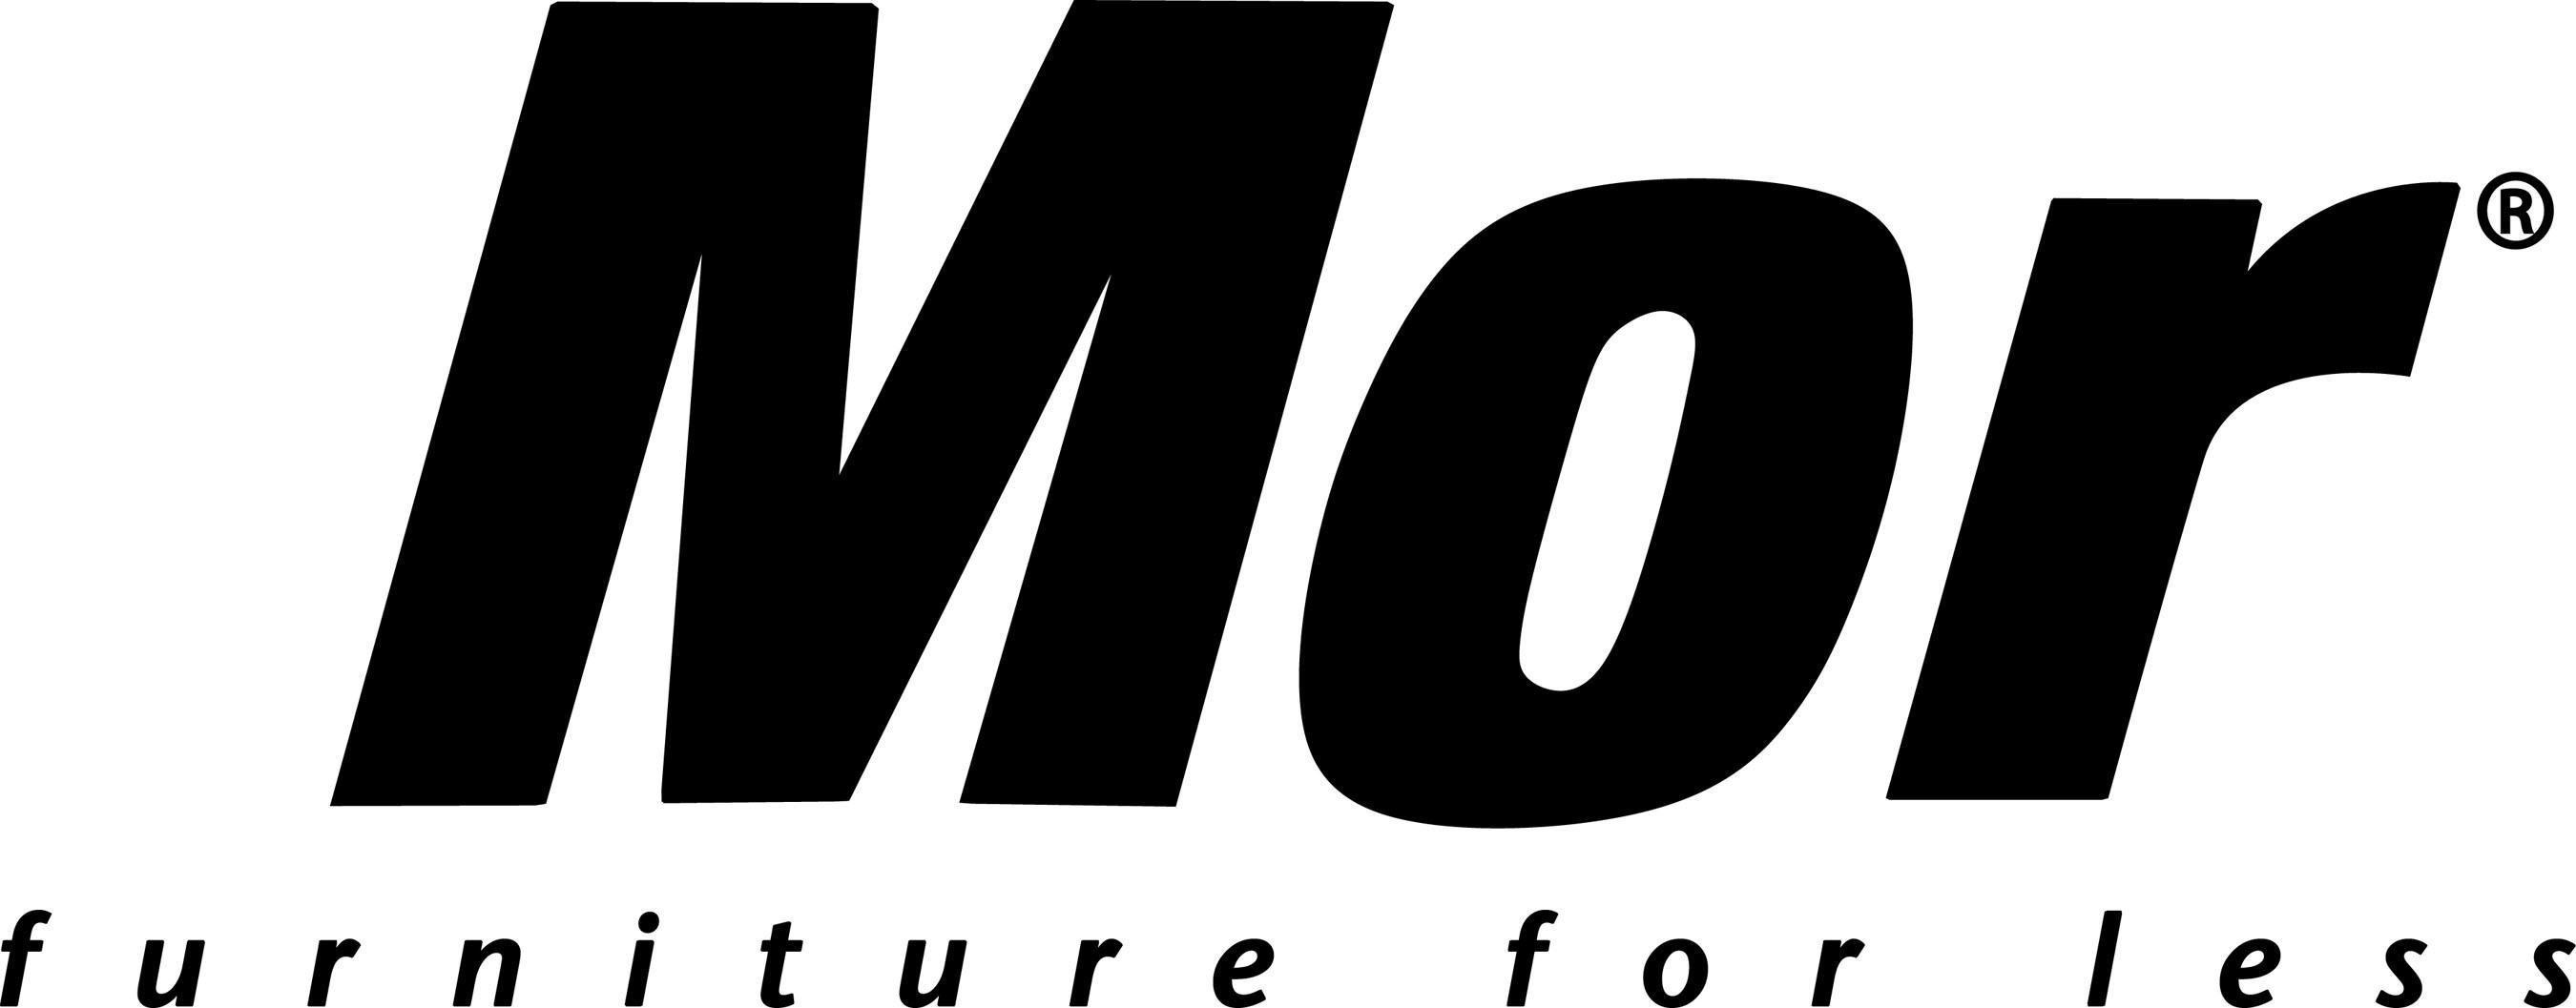 Mor Furniture For Less Opens Its 30th Furniture Store In Visalia, California